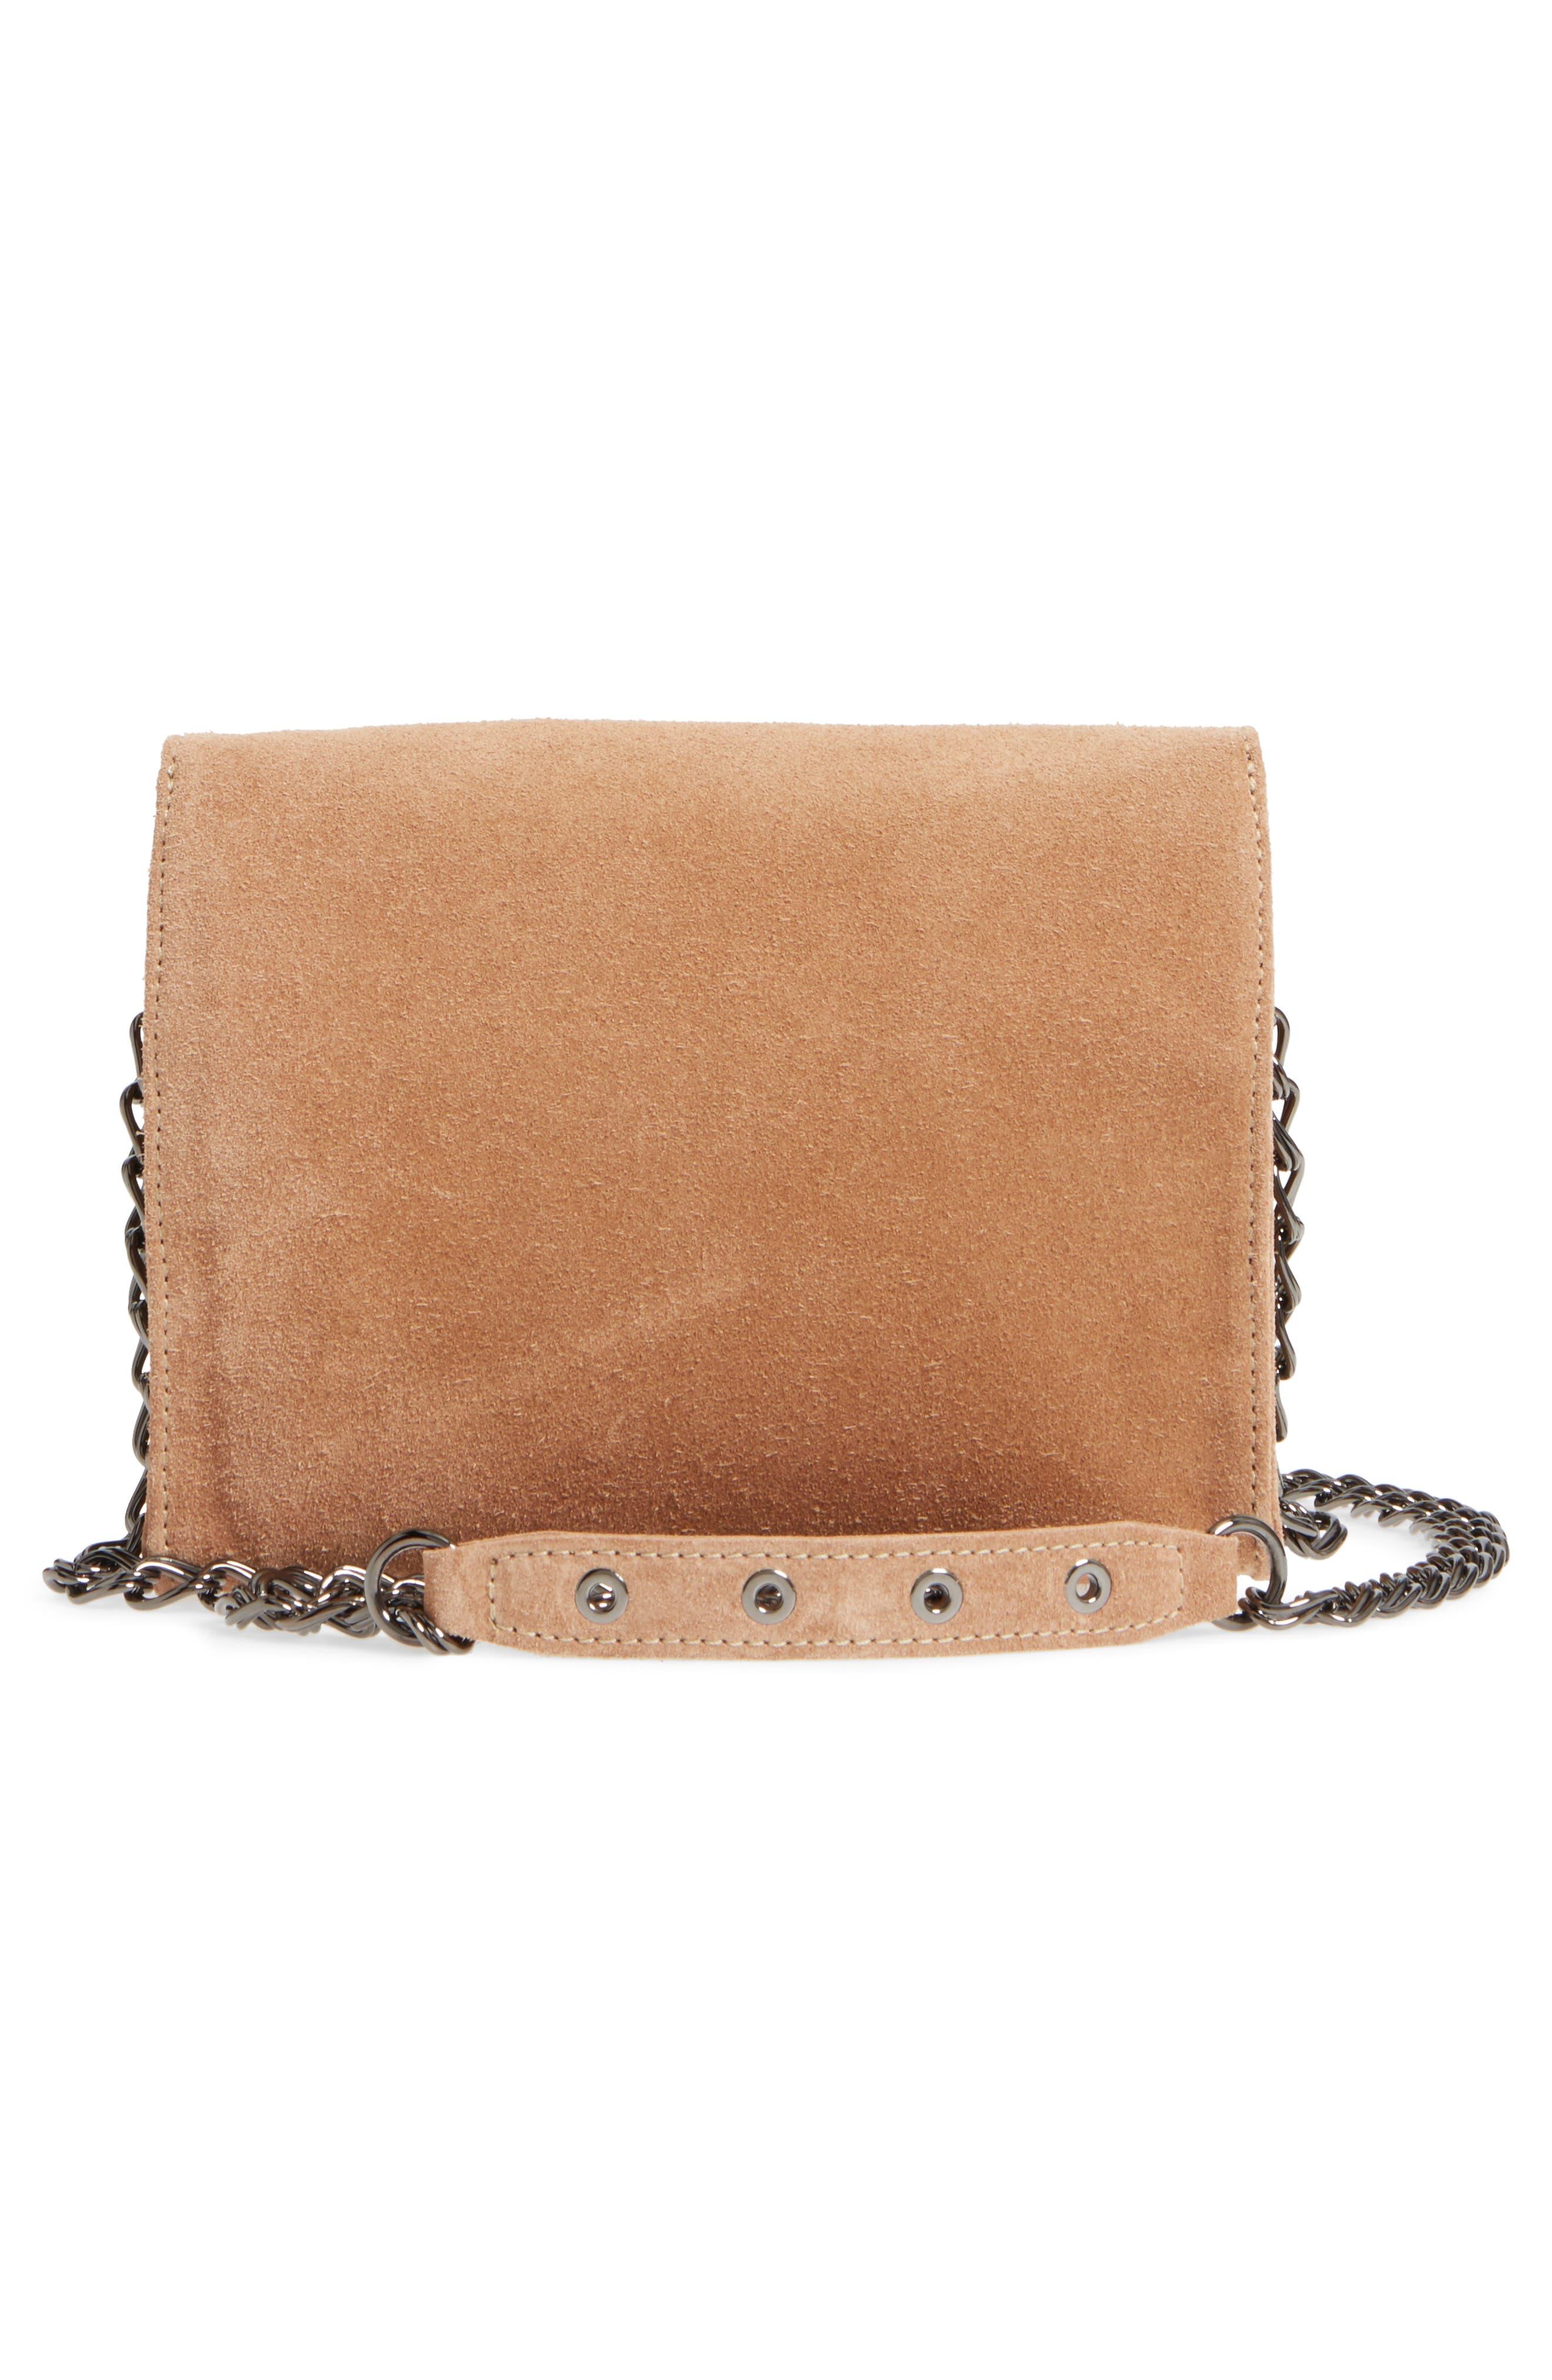 Alternate Image 3  - Longchamp Paris Rocks Fringe Calfskin Suede Crossbody Bag